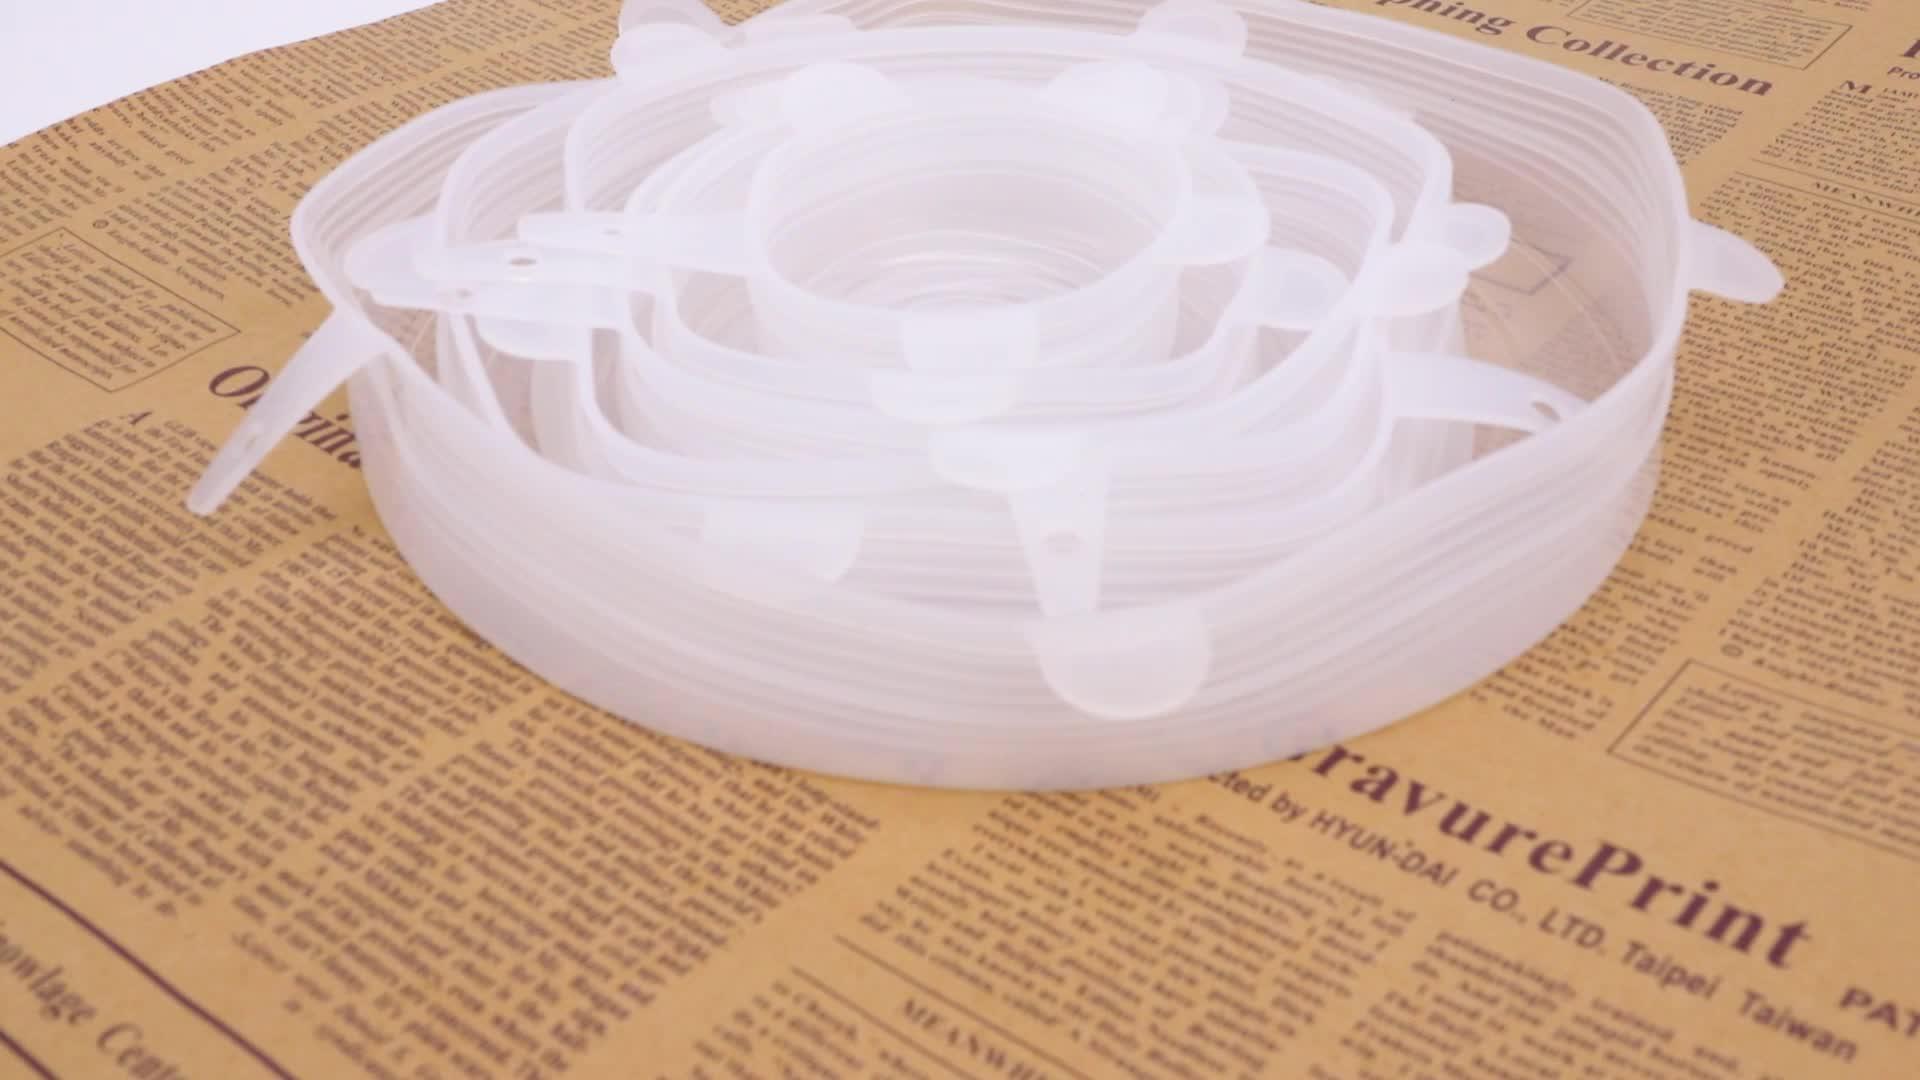 Food grade seal stretch lids silicone food wrap